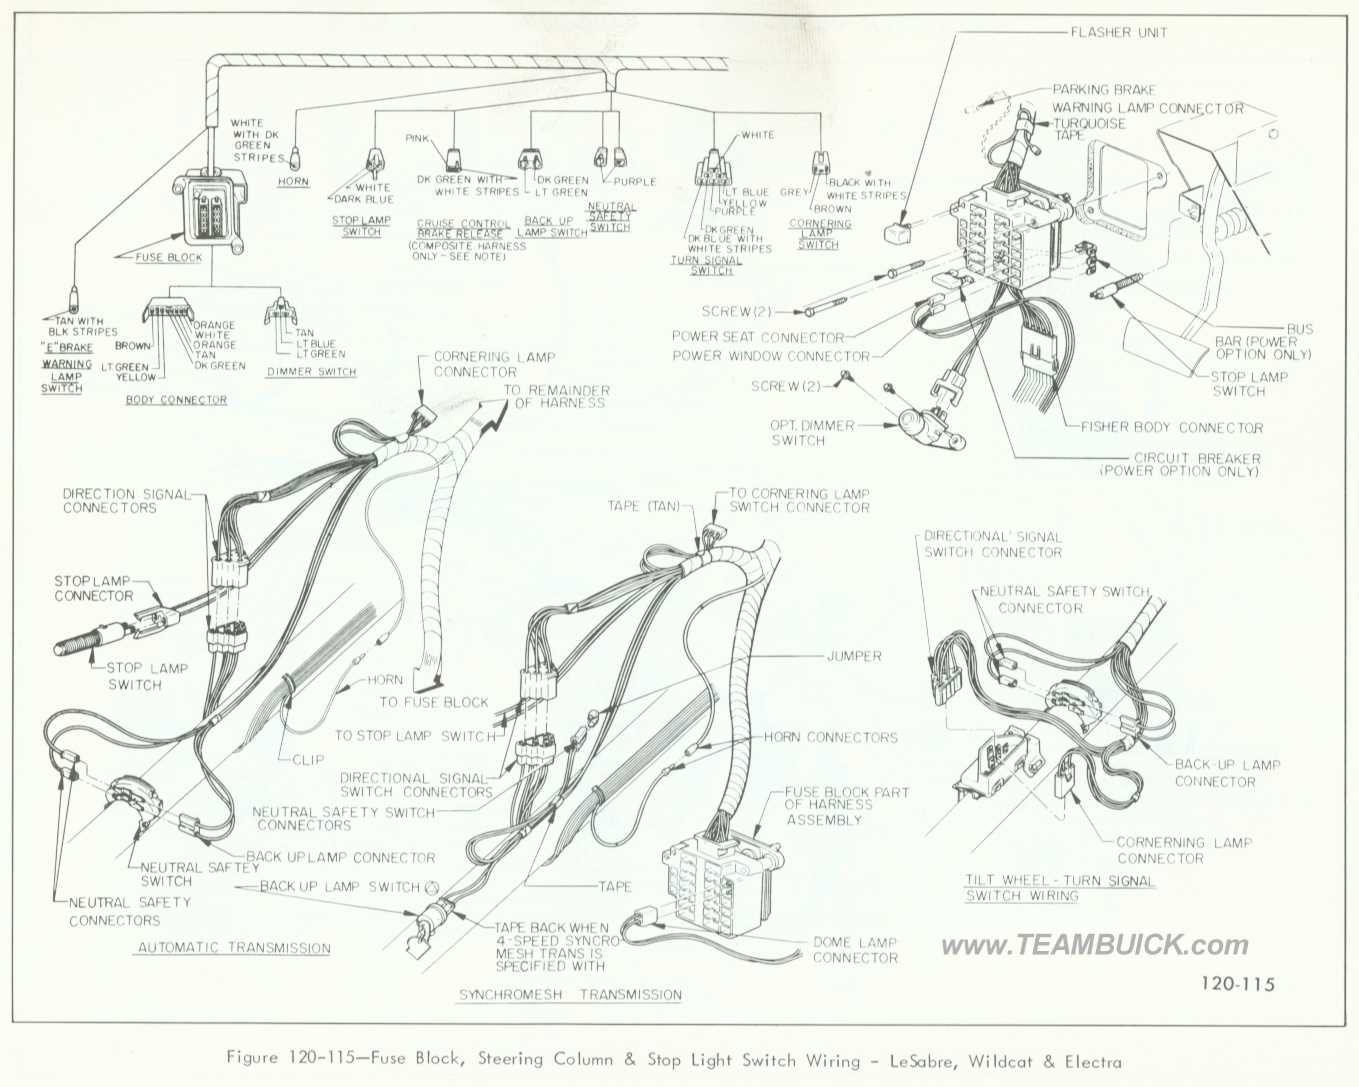 1966 Buick LeSabre, Wildcat, Electra, Fuse Block, Steering